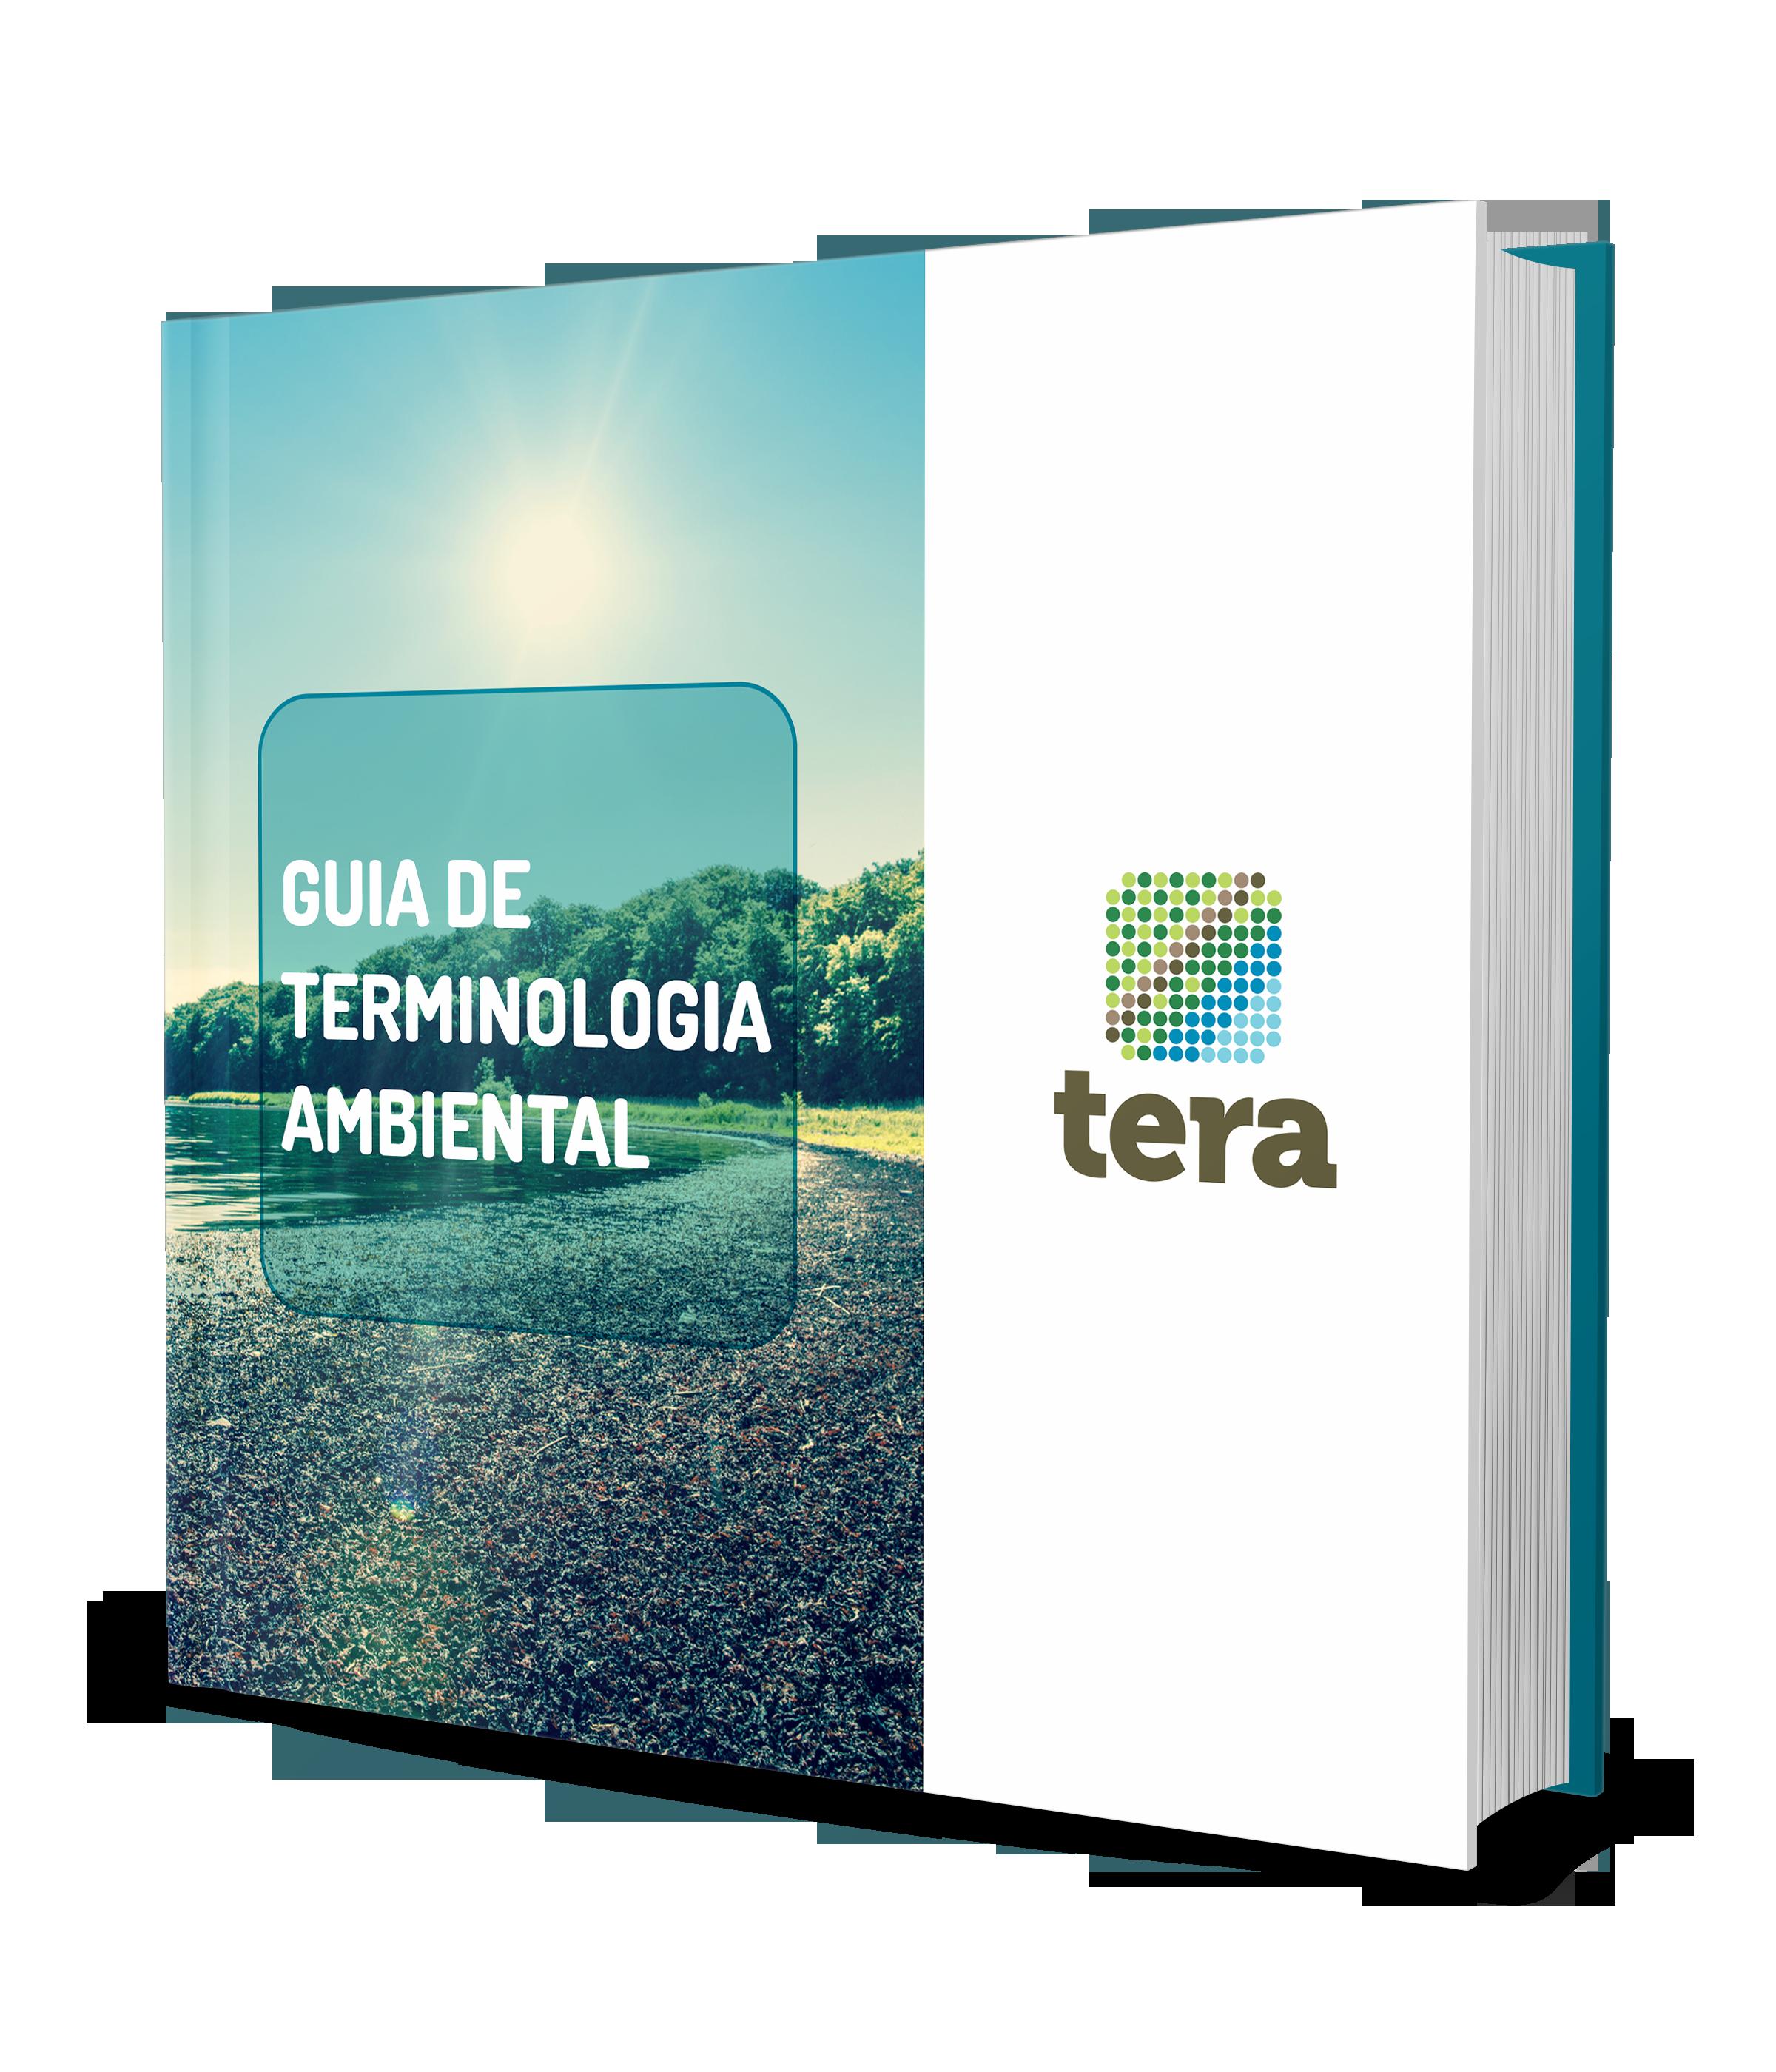 Guia de Terminologia Ambiental